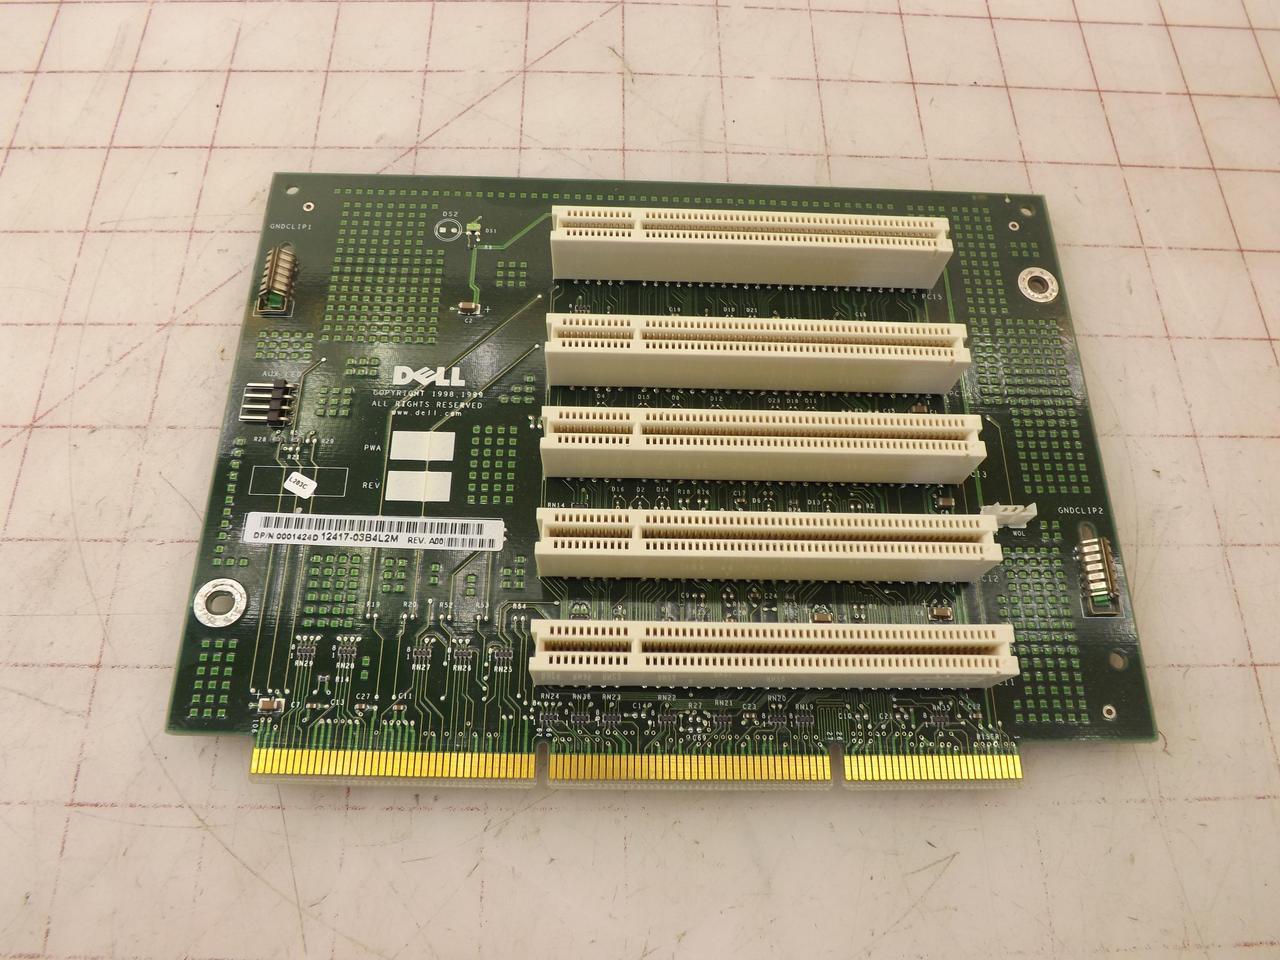 Dell 0001424D 12417 03B4L2M 6424d Extension Board T33358